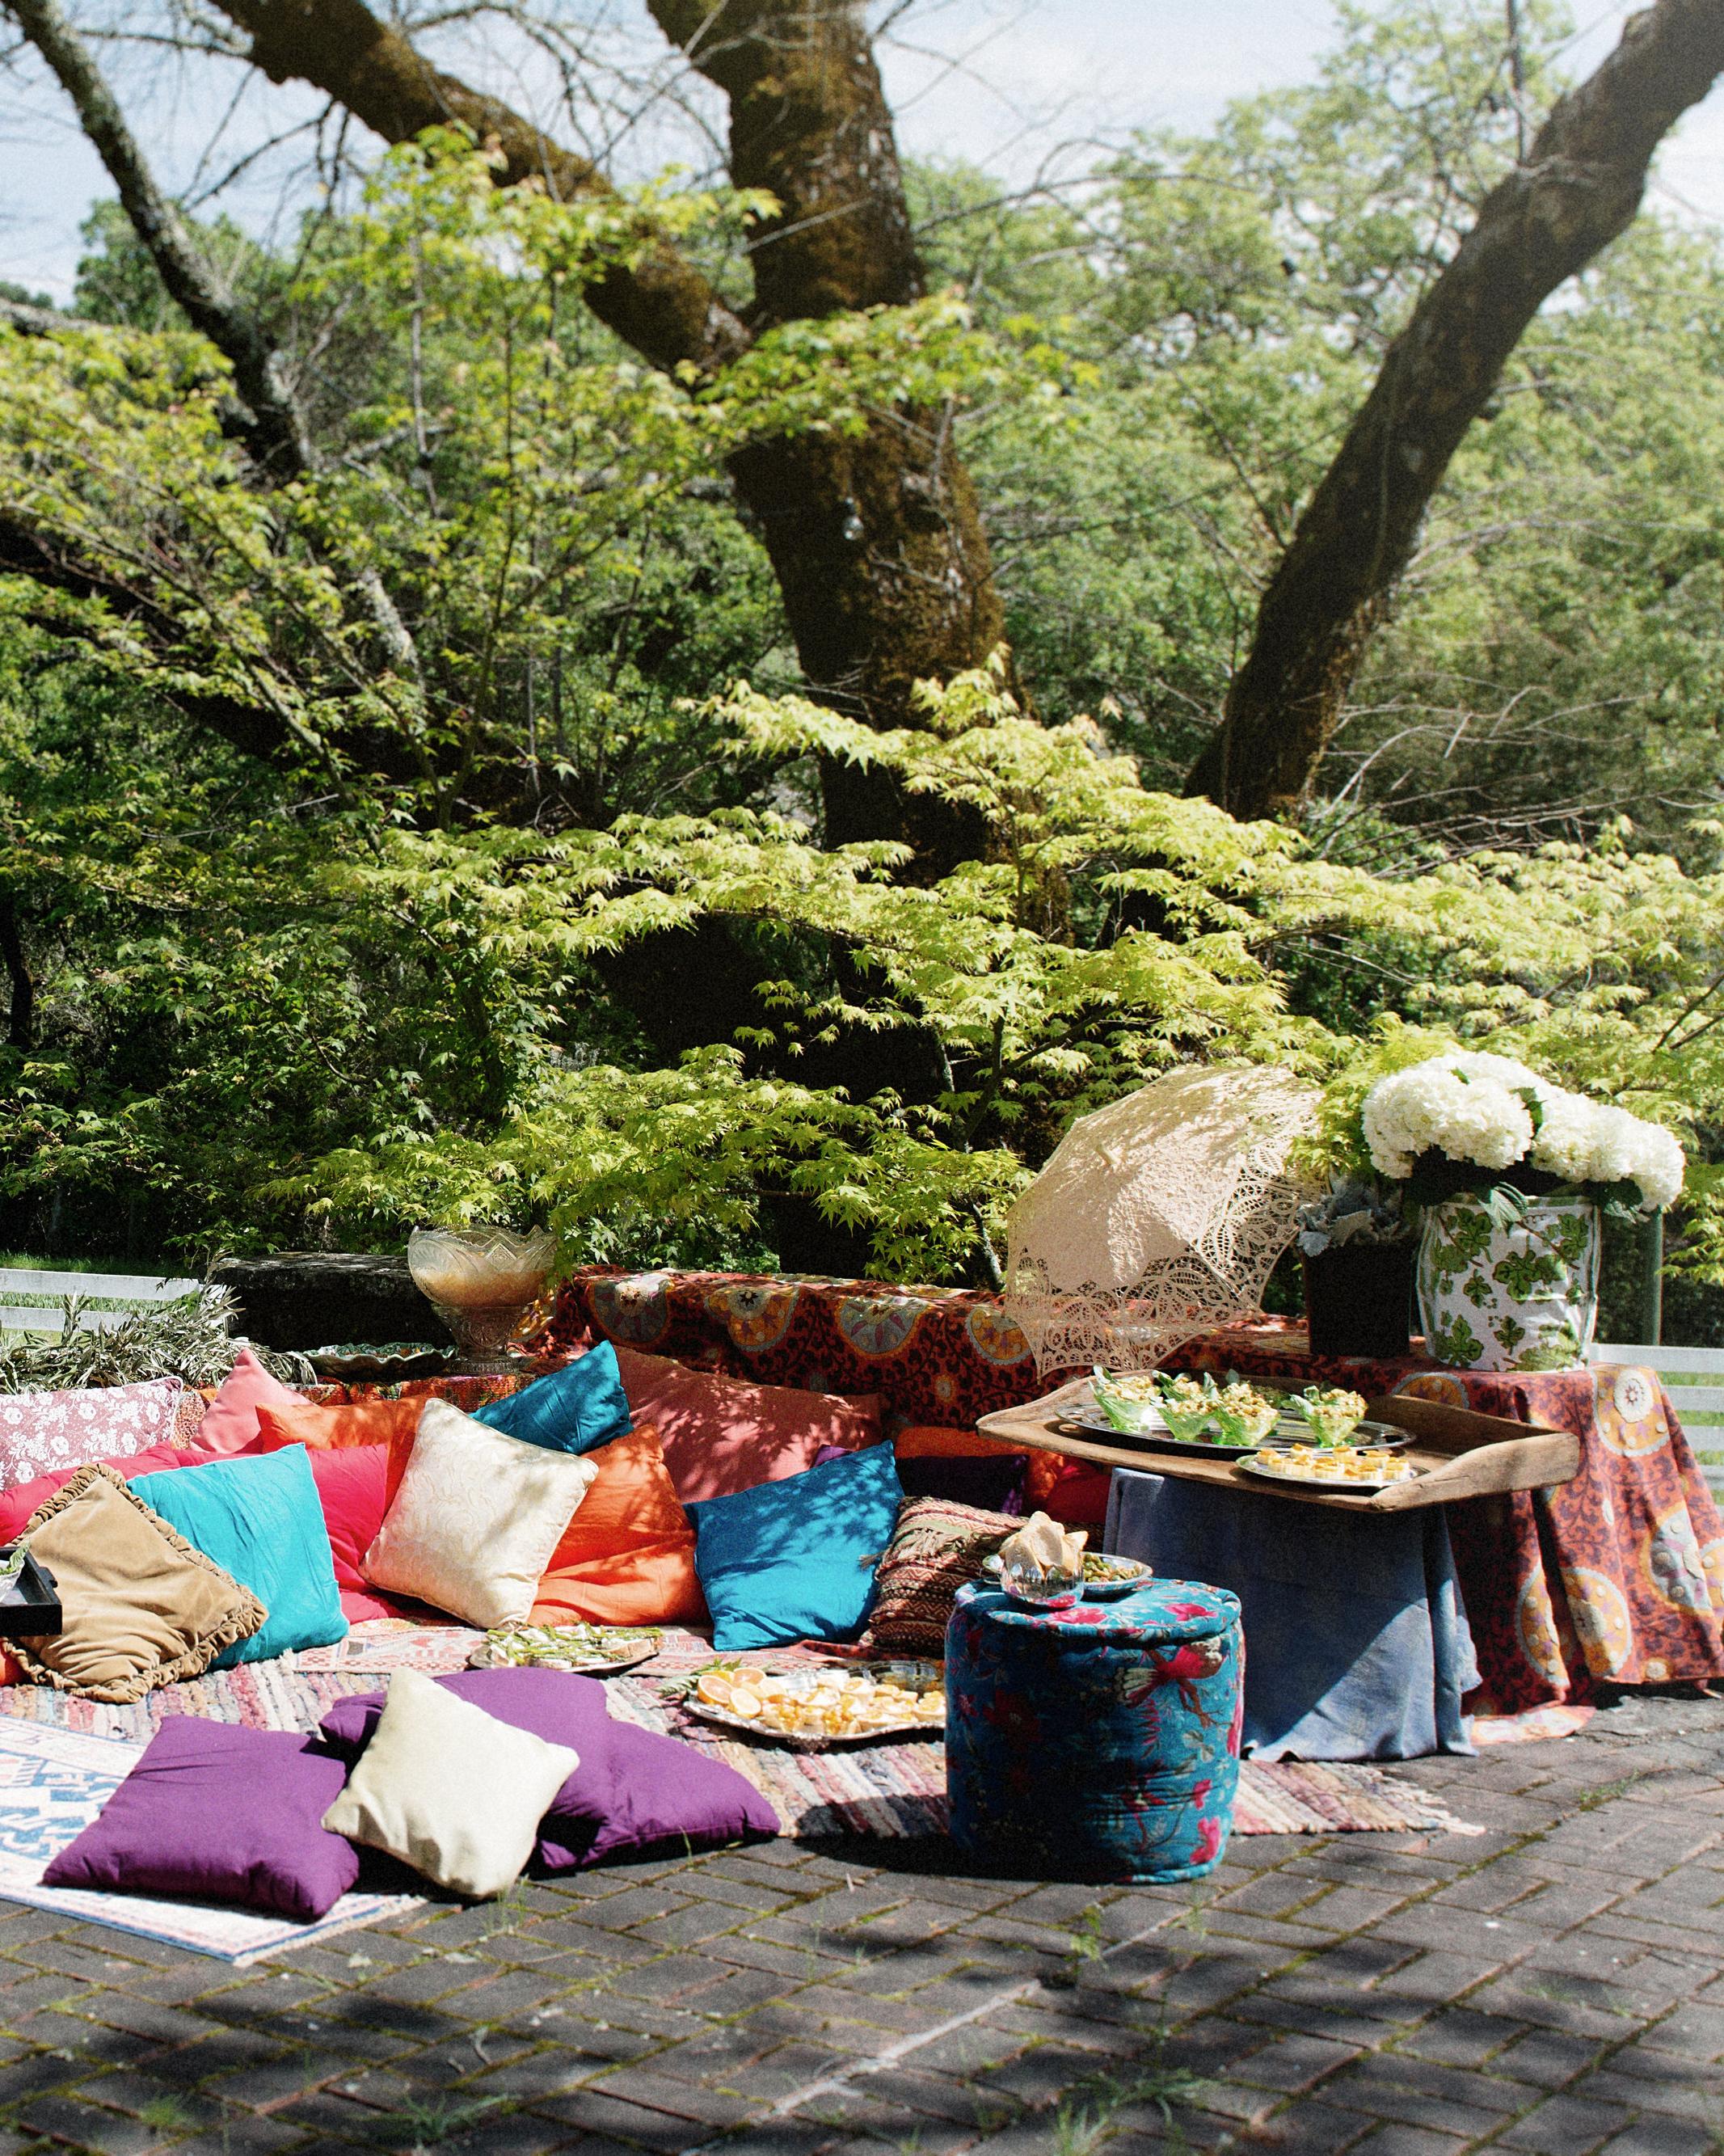 scavenger-hunt-bridal-shower-outdoor-picnic-0315.jpg